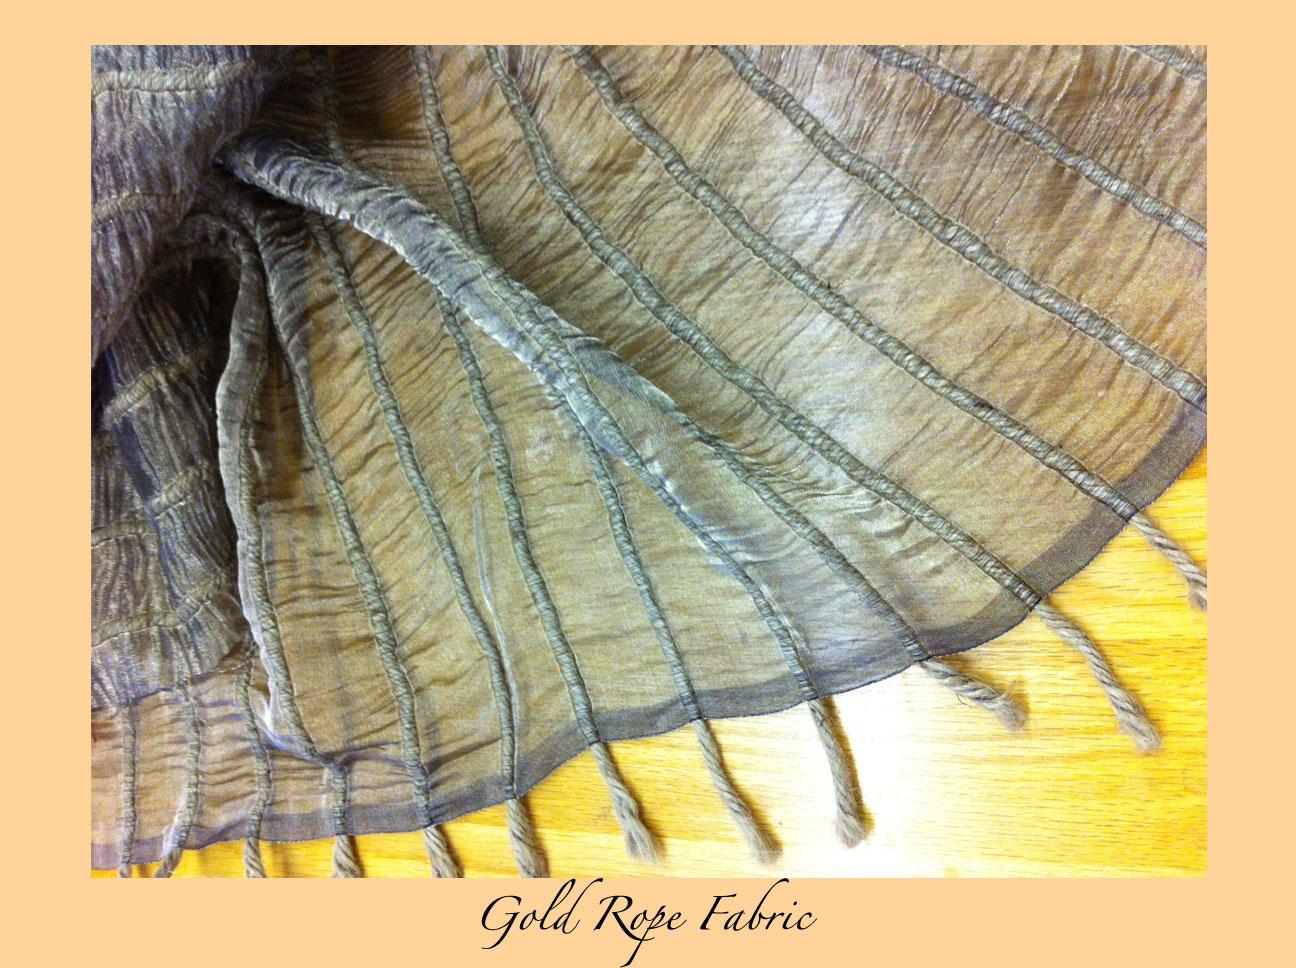 gold rope fabric.jpg